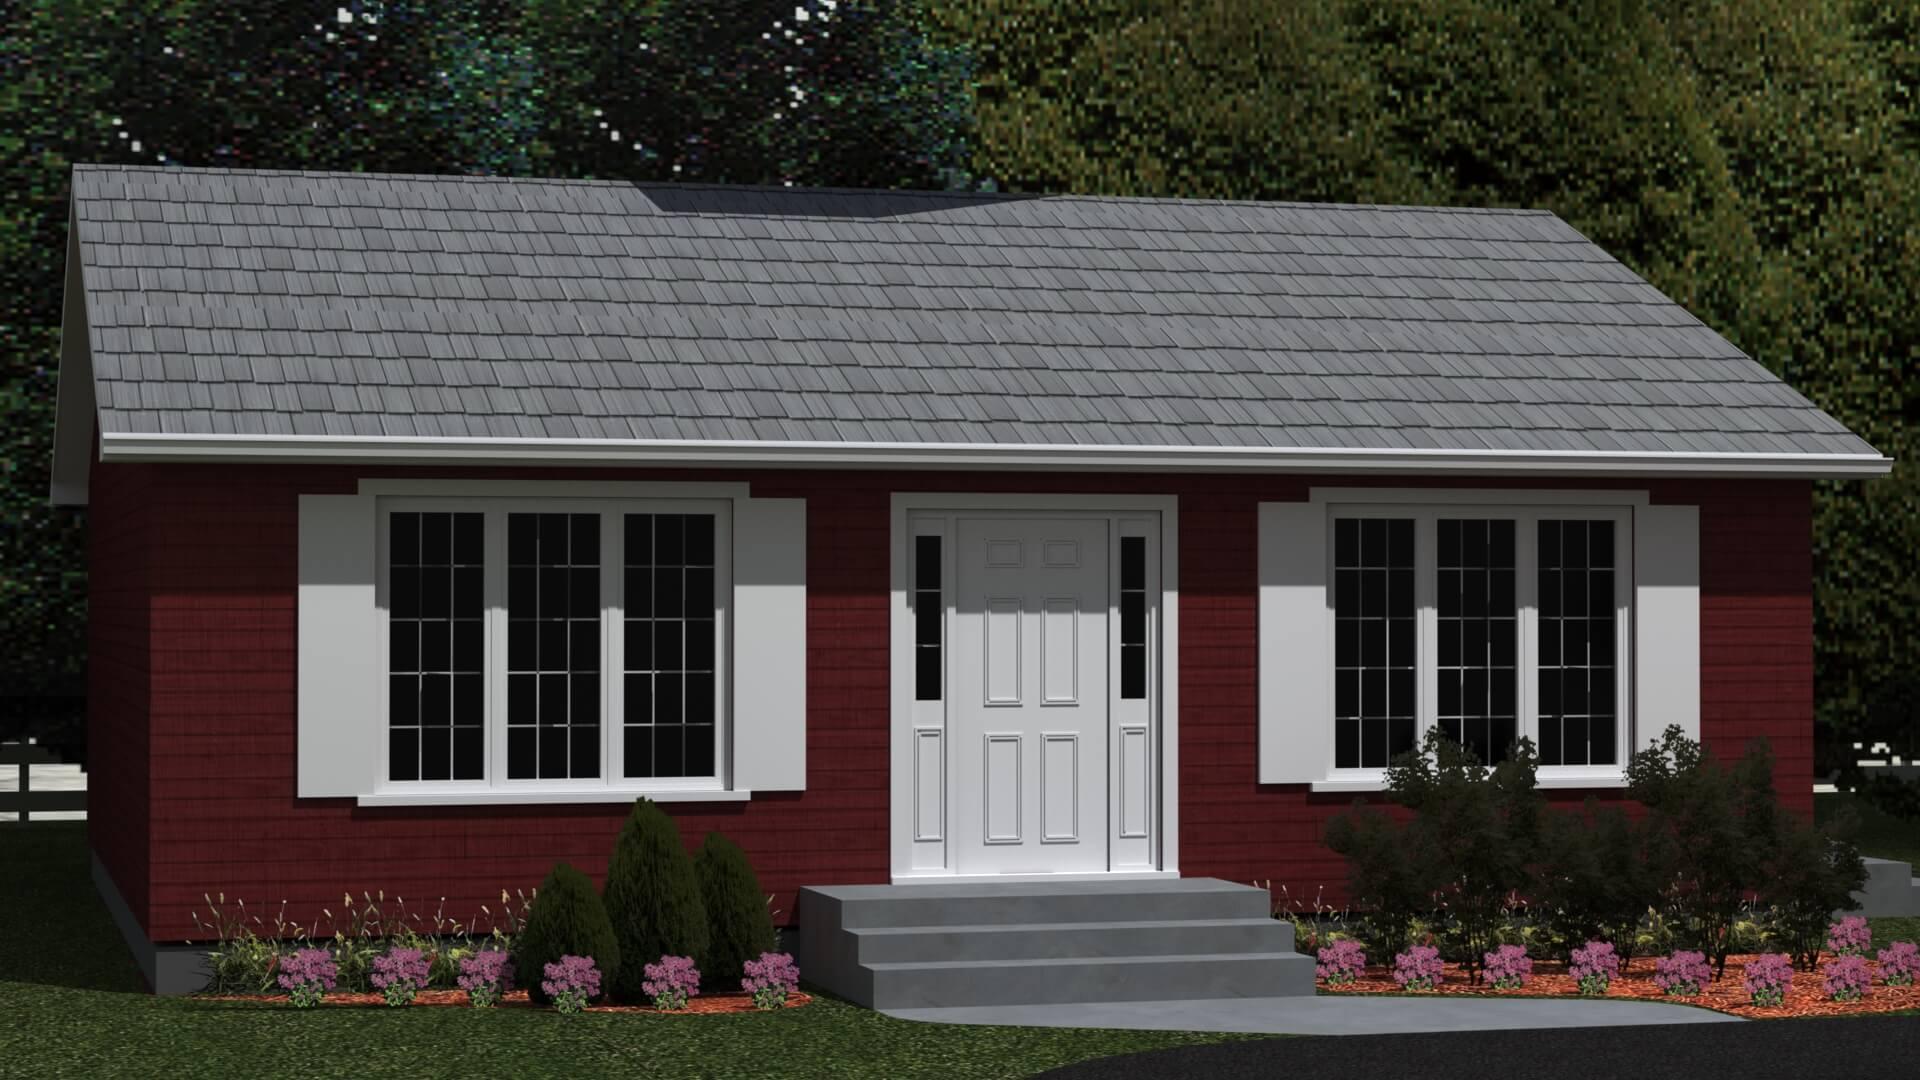 896 house exterior